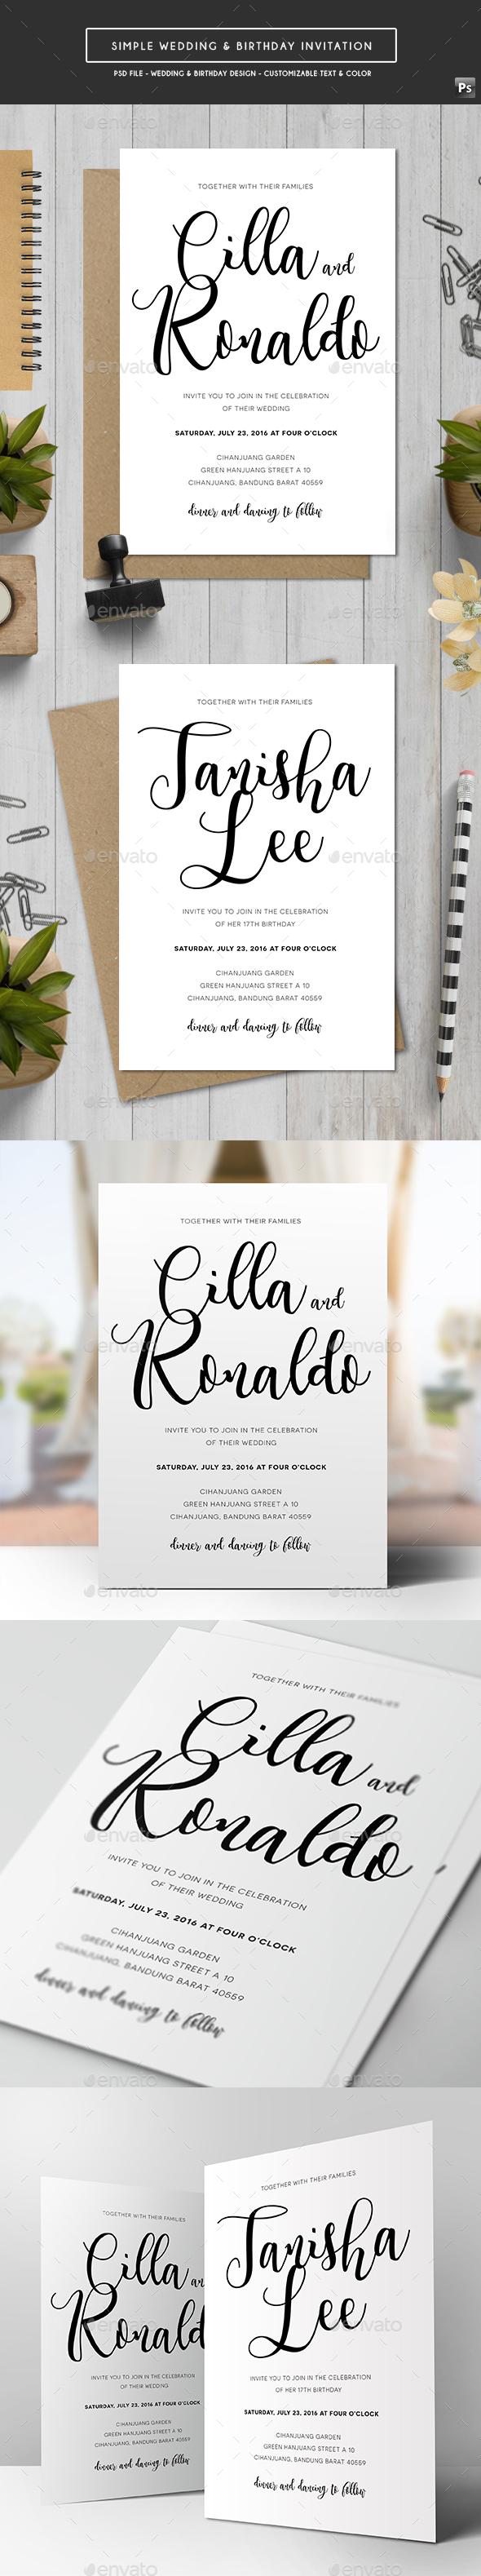 Simple Wedding & Birthday Invitation